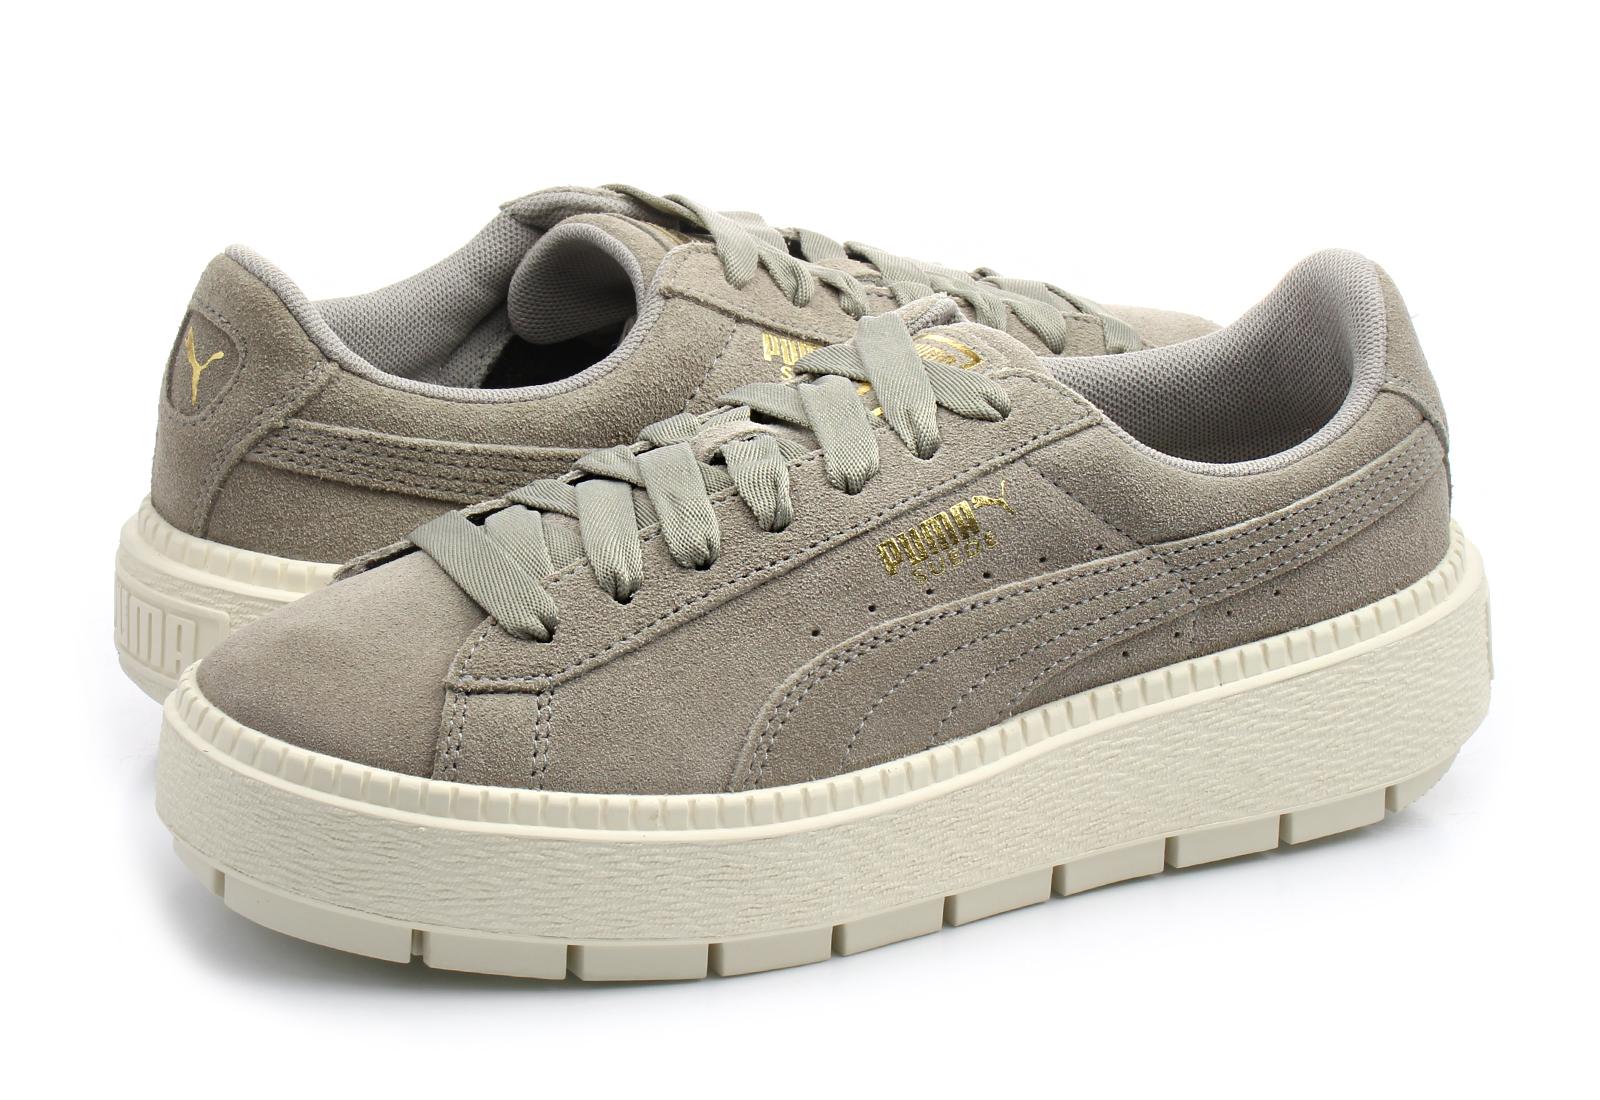 Puma Shoes - Suede Platform Rugged Wns - 36583006-nat - Online ... fd990a64ea4